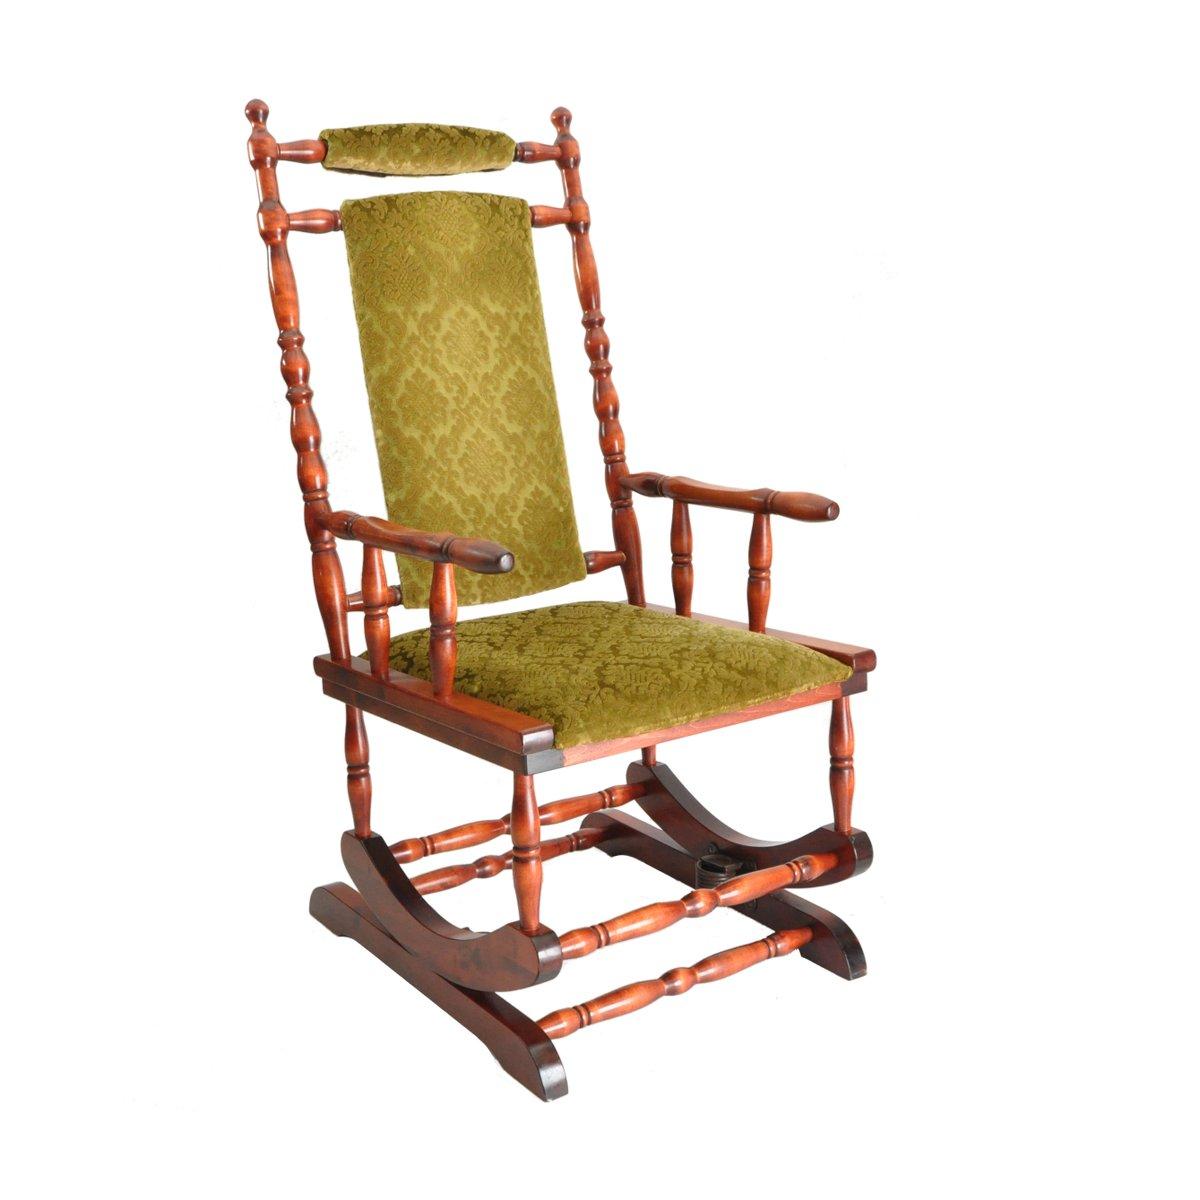 wooden glider chair australia folding regina spektor chords scandinavian rocking 1950s for sale at pamono